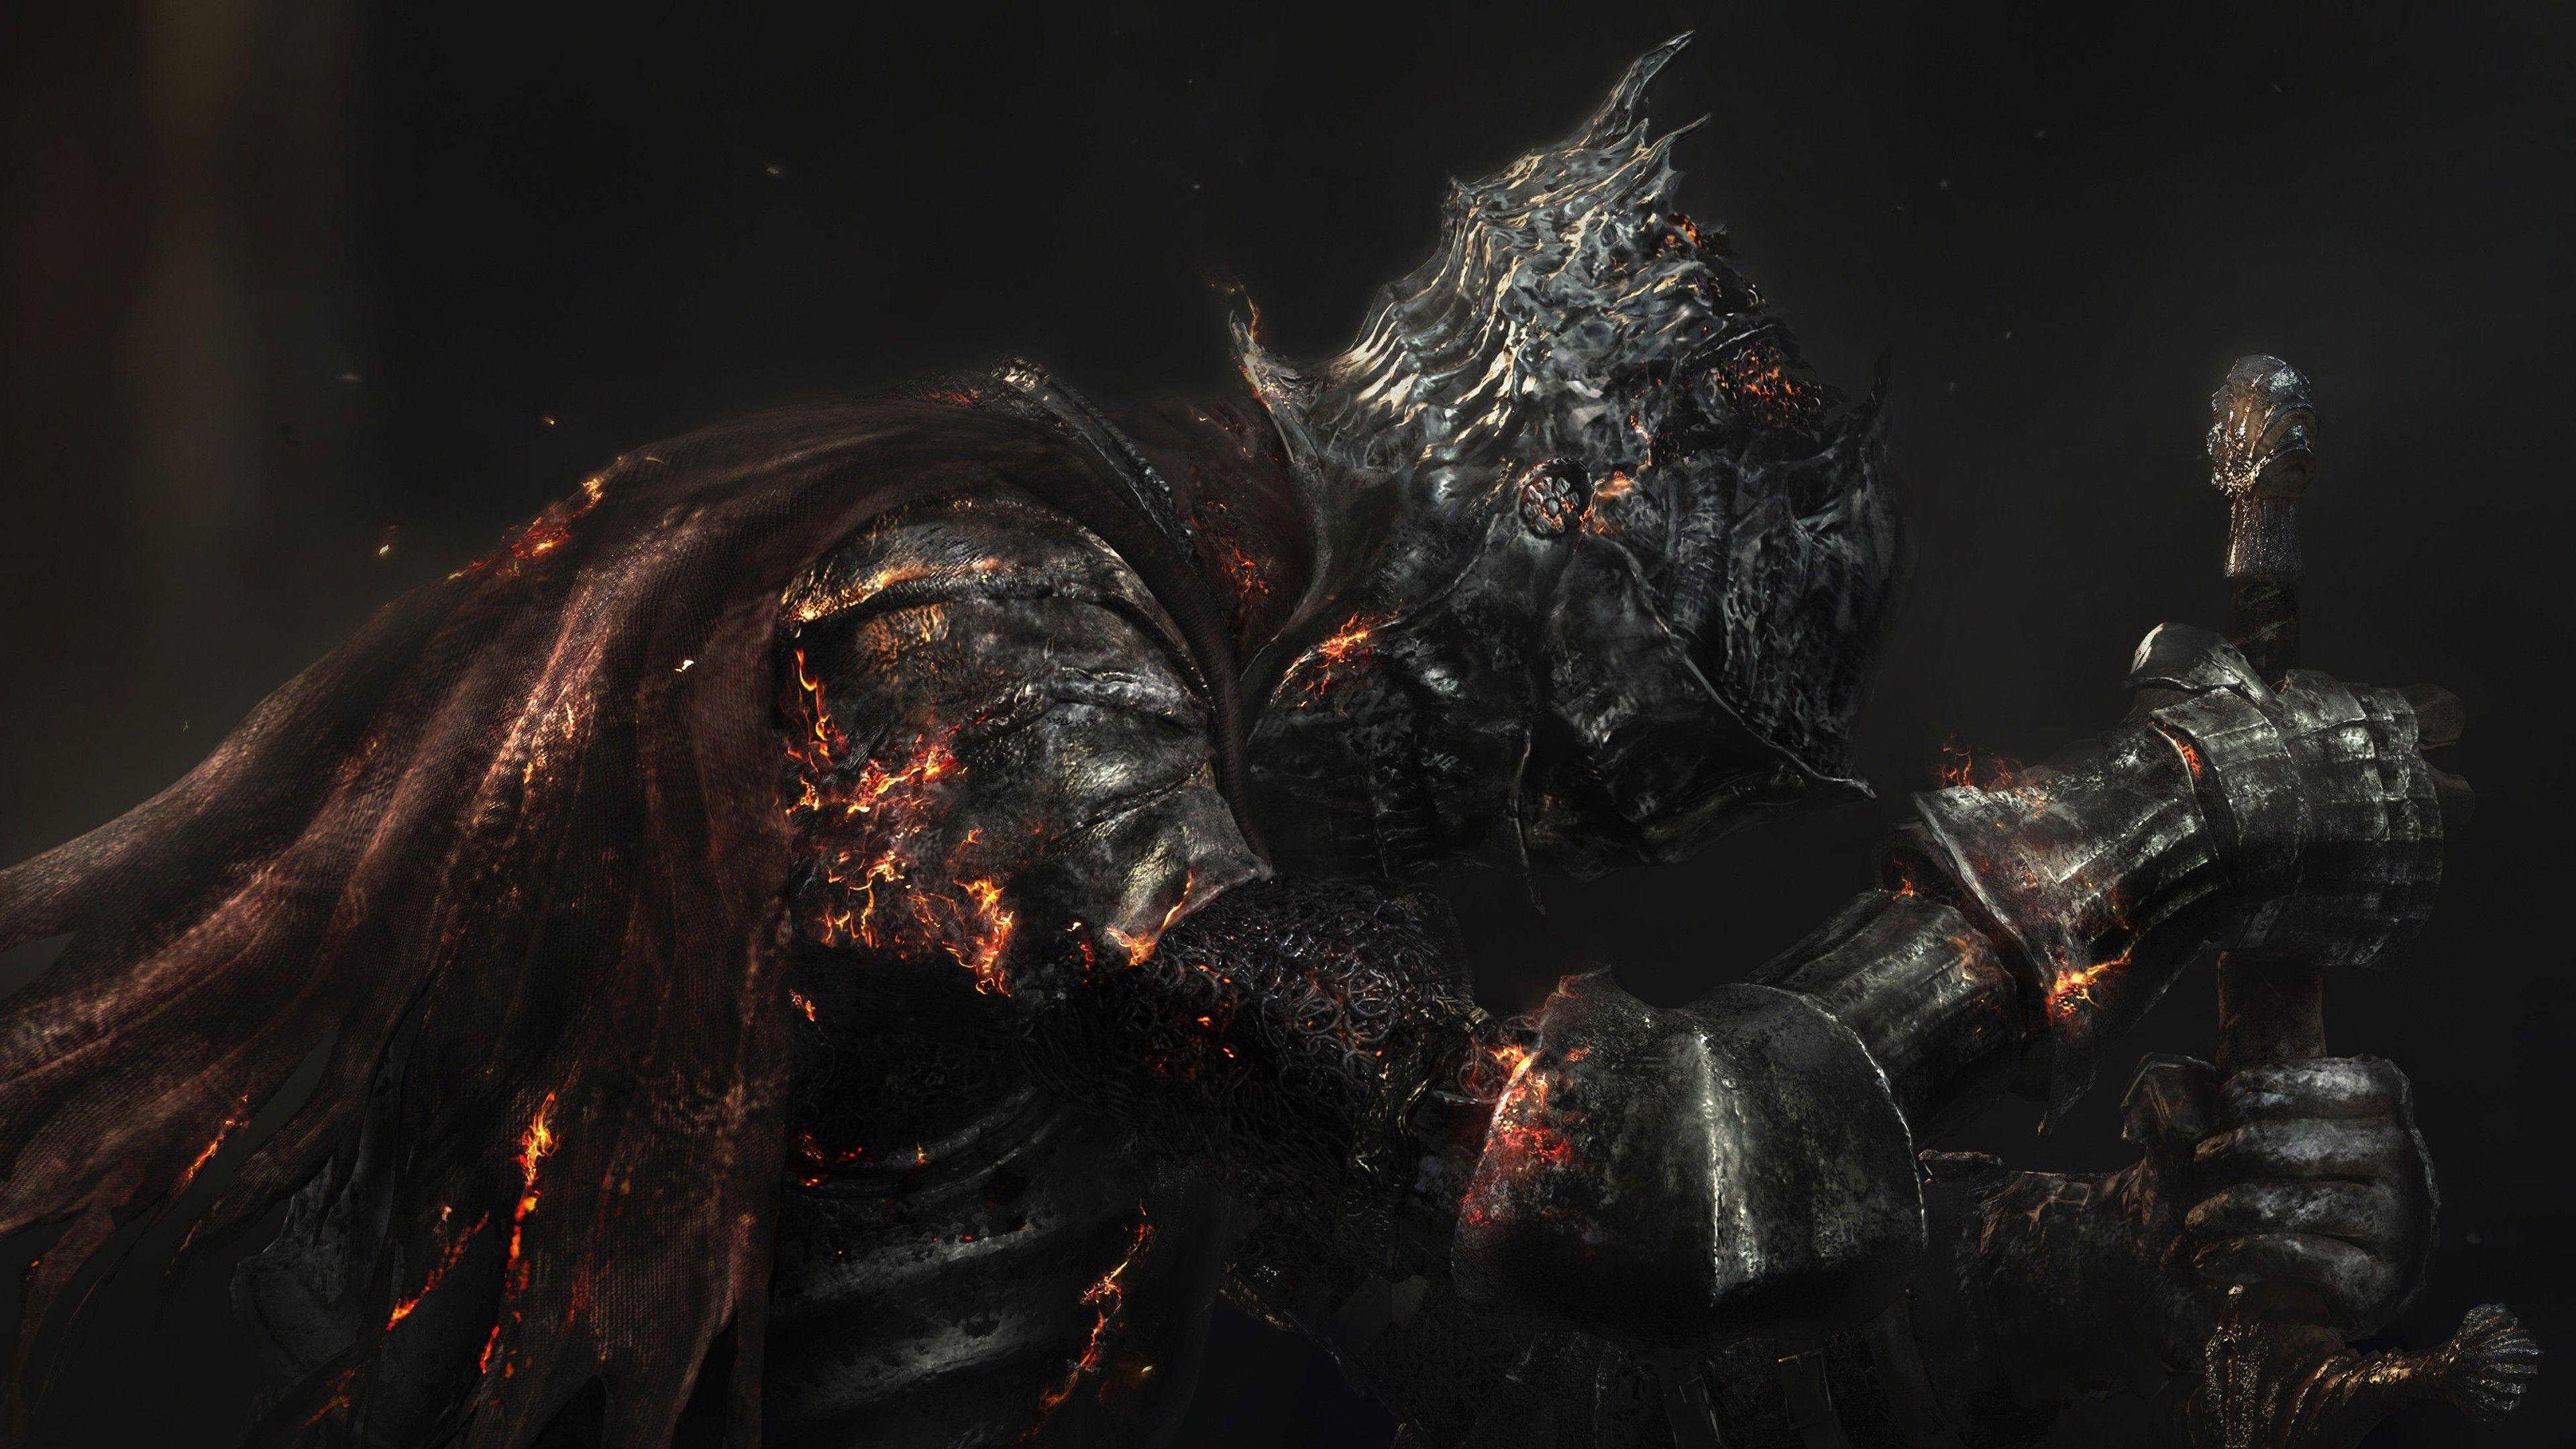 4k Dark Souls Wallpapers Top Free 4k Dark Souls Backgrounds